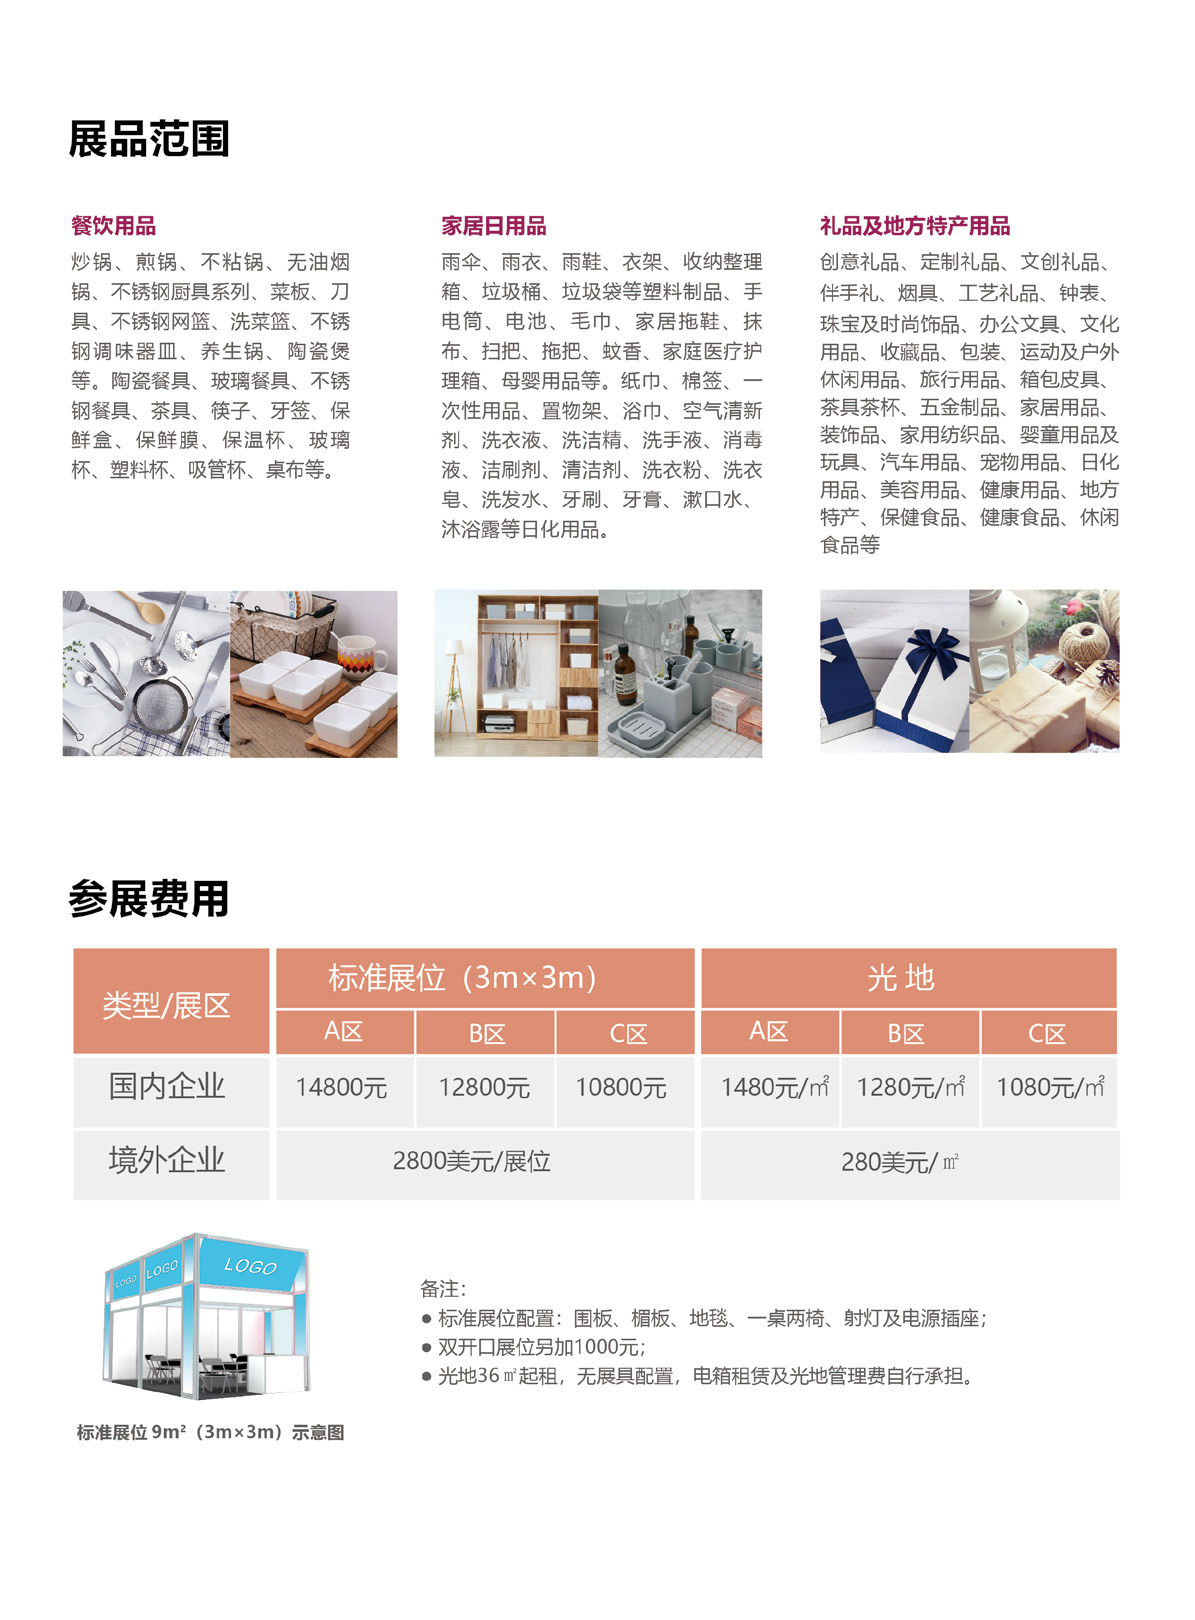 CCF春季百货展2021邀请_页面_06.jpg